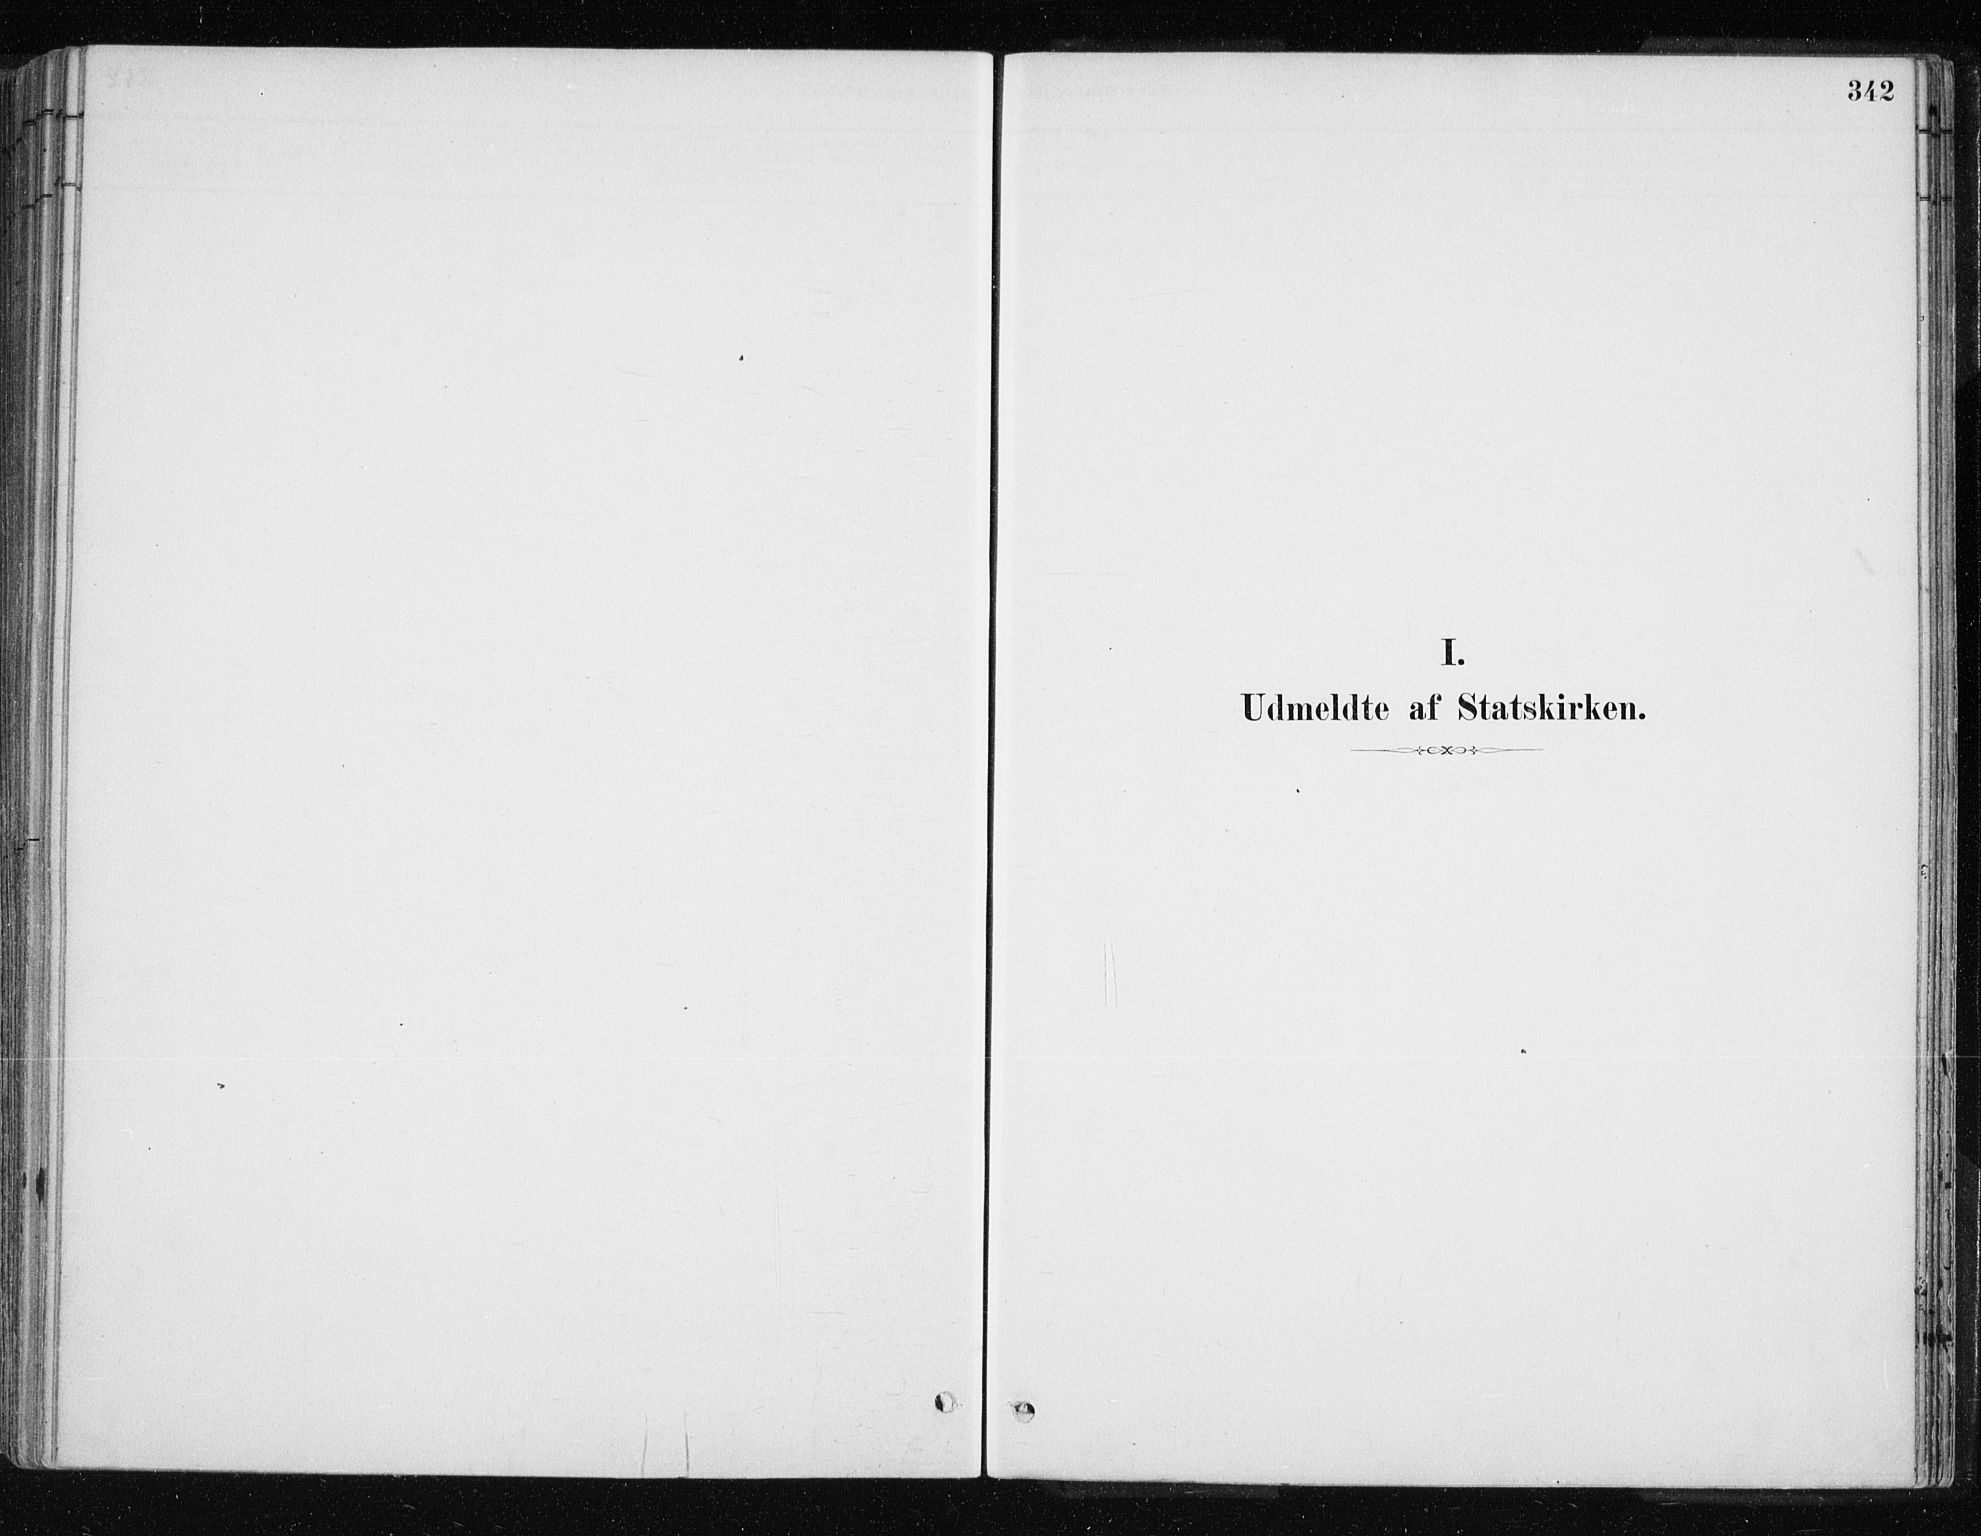 SATØ, Lyngen sokneprestembete, H/He/Hea/L0007kirke: Ministerialbok nr. 7, 1879-1890, s. 342